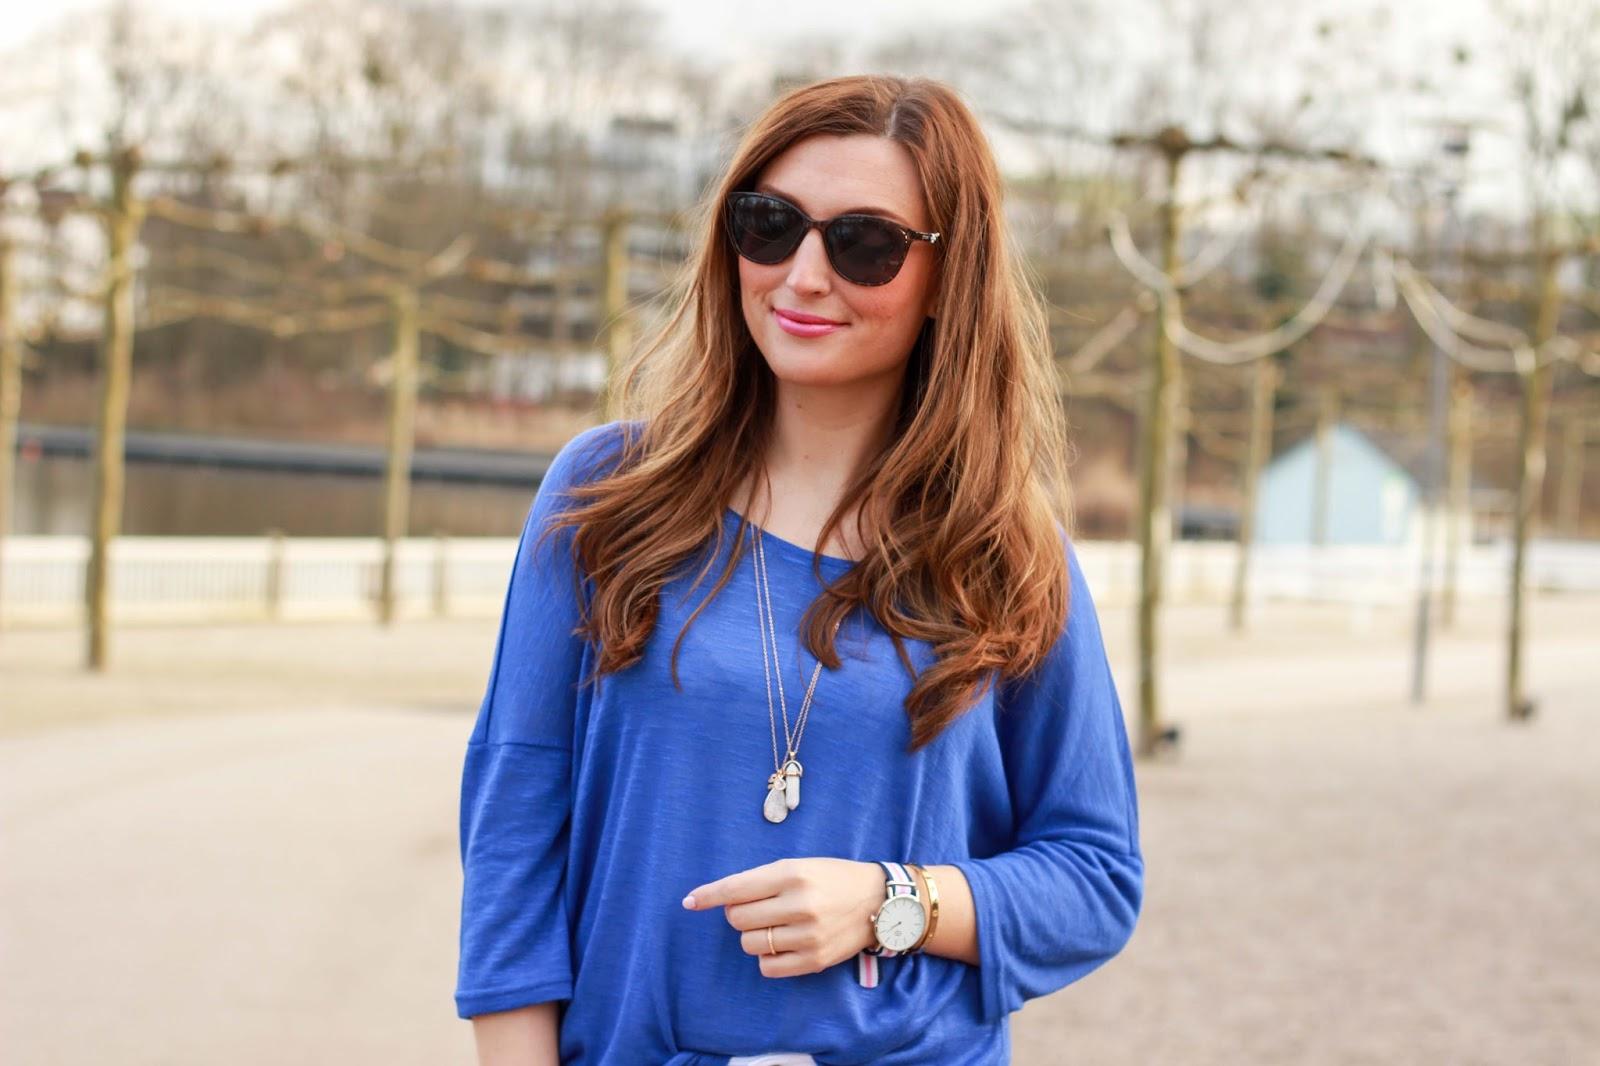 MyColloseum-Fashionstylebyjohanna-Colloseum-Outfitinspiration Fashionblogger-Fashionblog-German Blogger